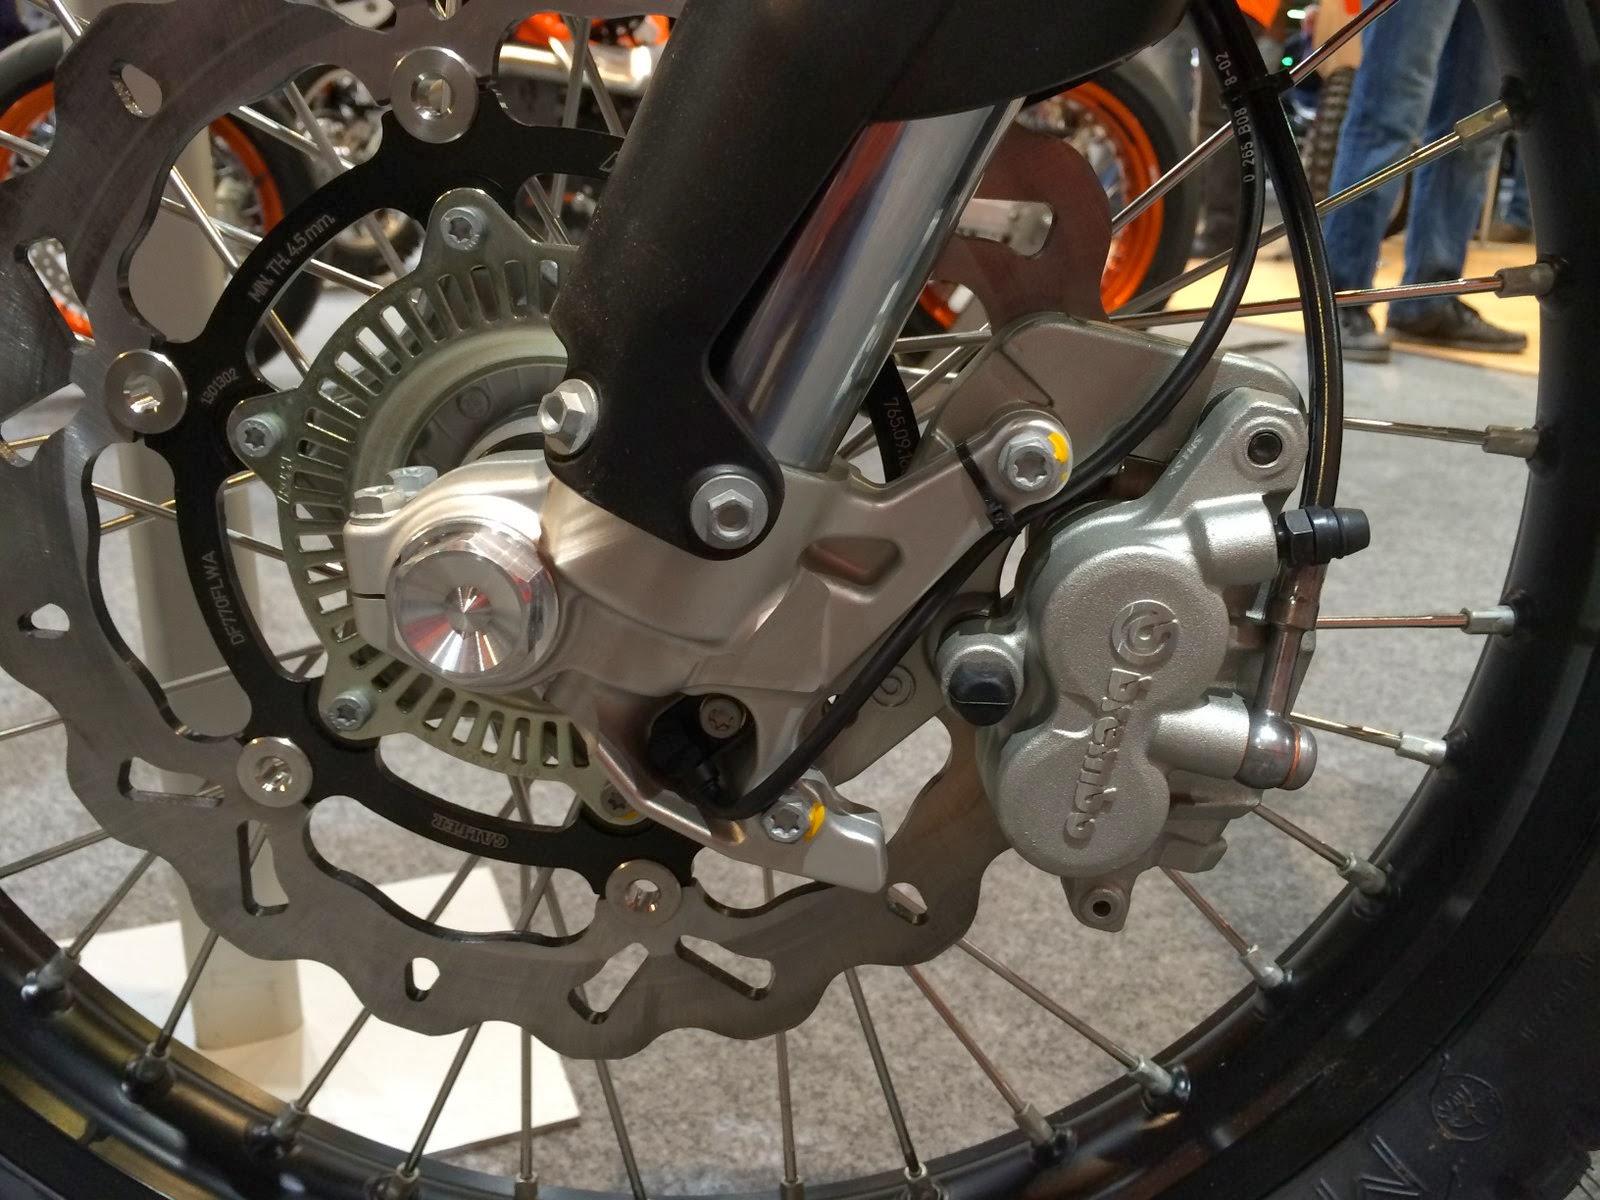 2014 KTM 690 Eduroro R front brake rotor